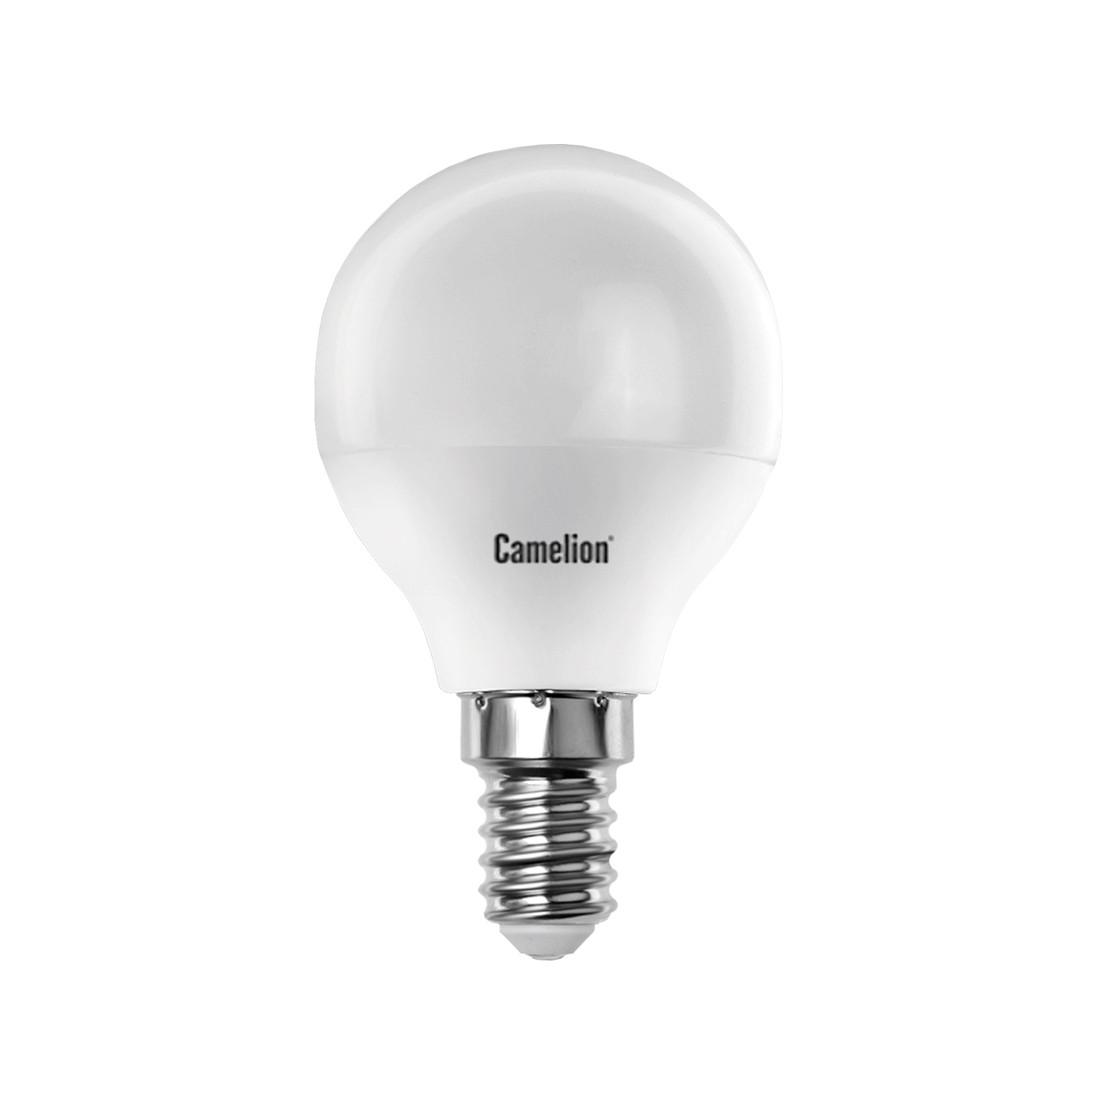 Эл. лампа светодиодная Camelion G45/3000К/E14/7Вт, Тёплый